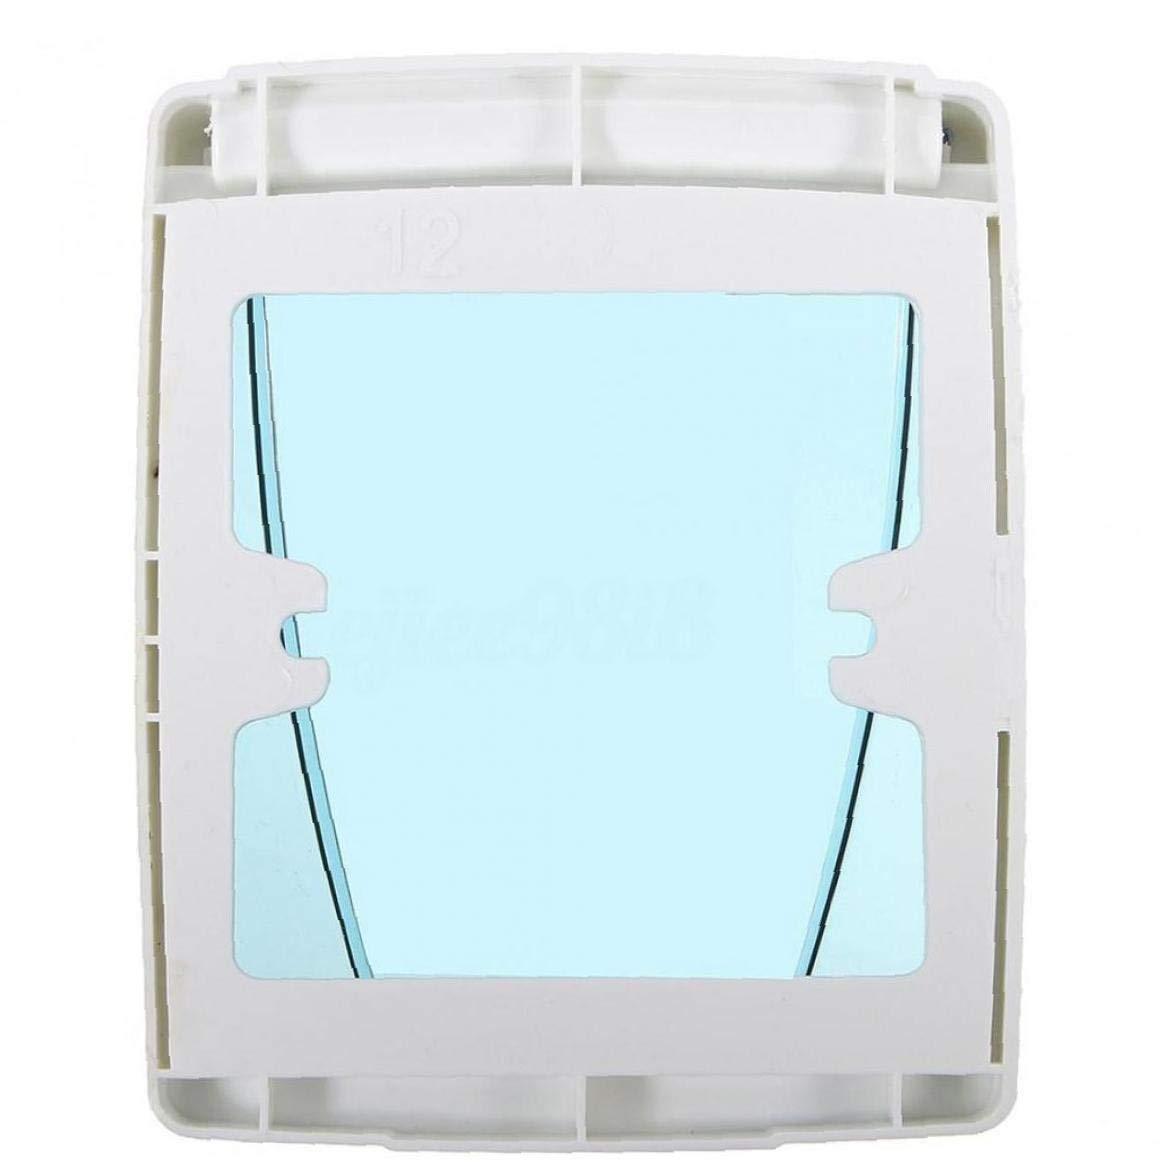 Lankater Impermeable 86 Tipo de Enchufe de Pared del Panel Placa del Interruptor Universal de la Caja de la Cubierta del Protector Azul